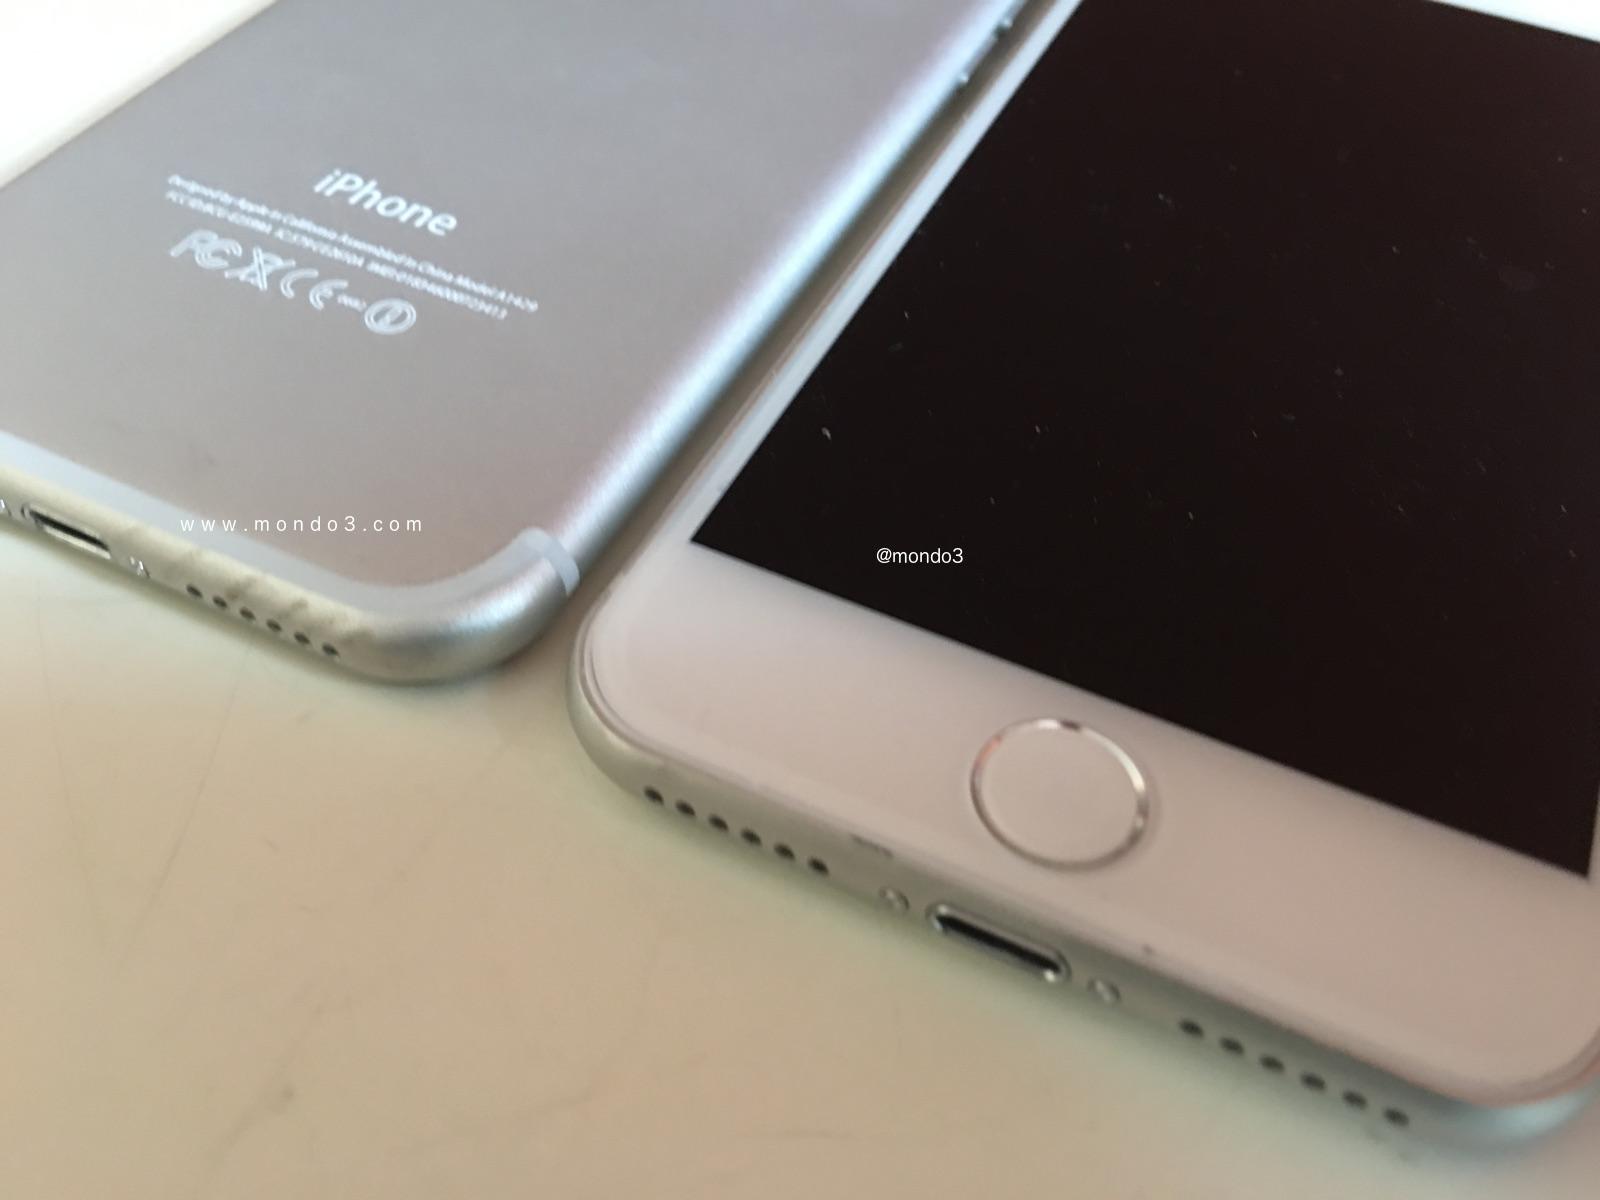 iPhone 7 a listino, Sunrise anticipa tutti: in offerta senza costi aggiuntivi